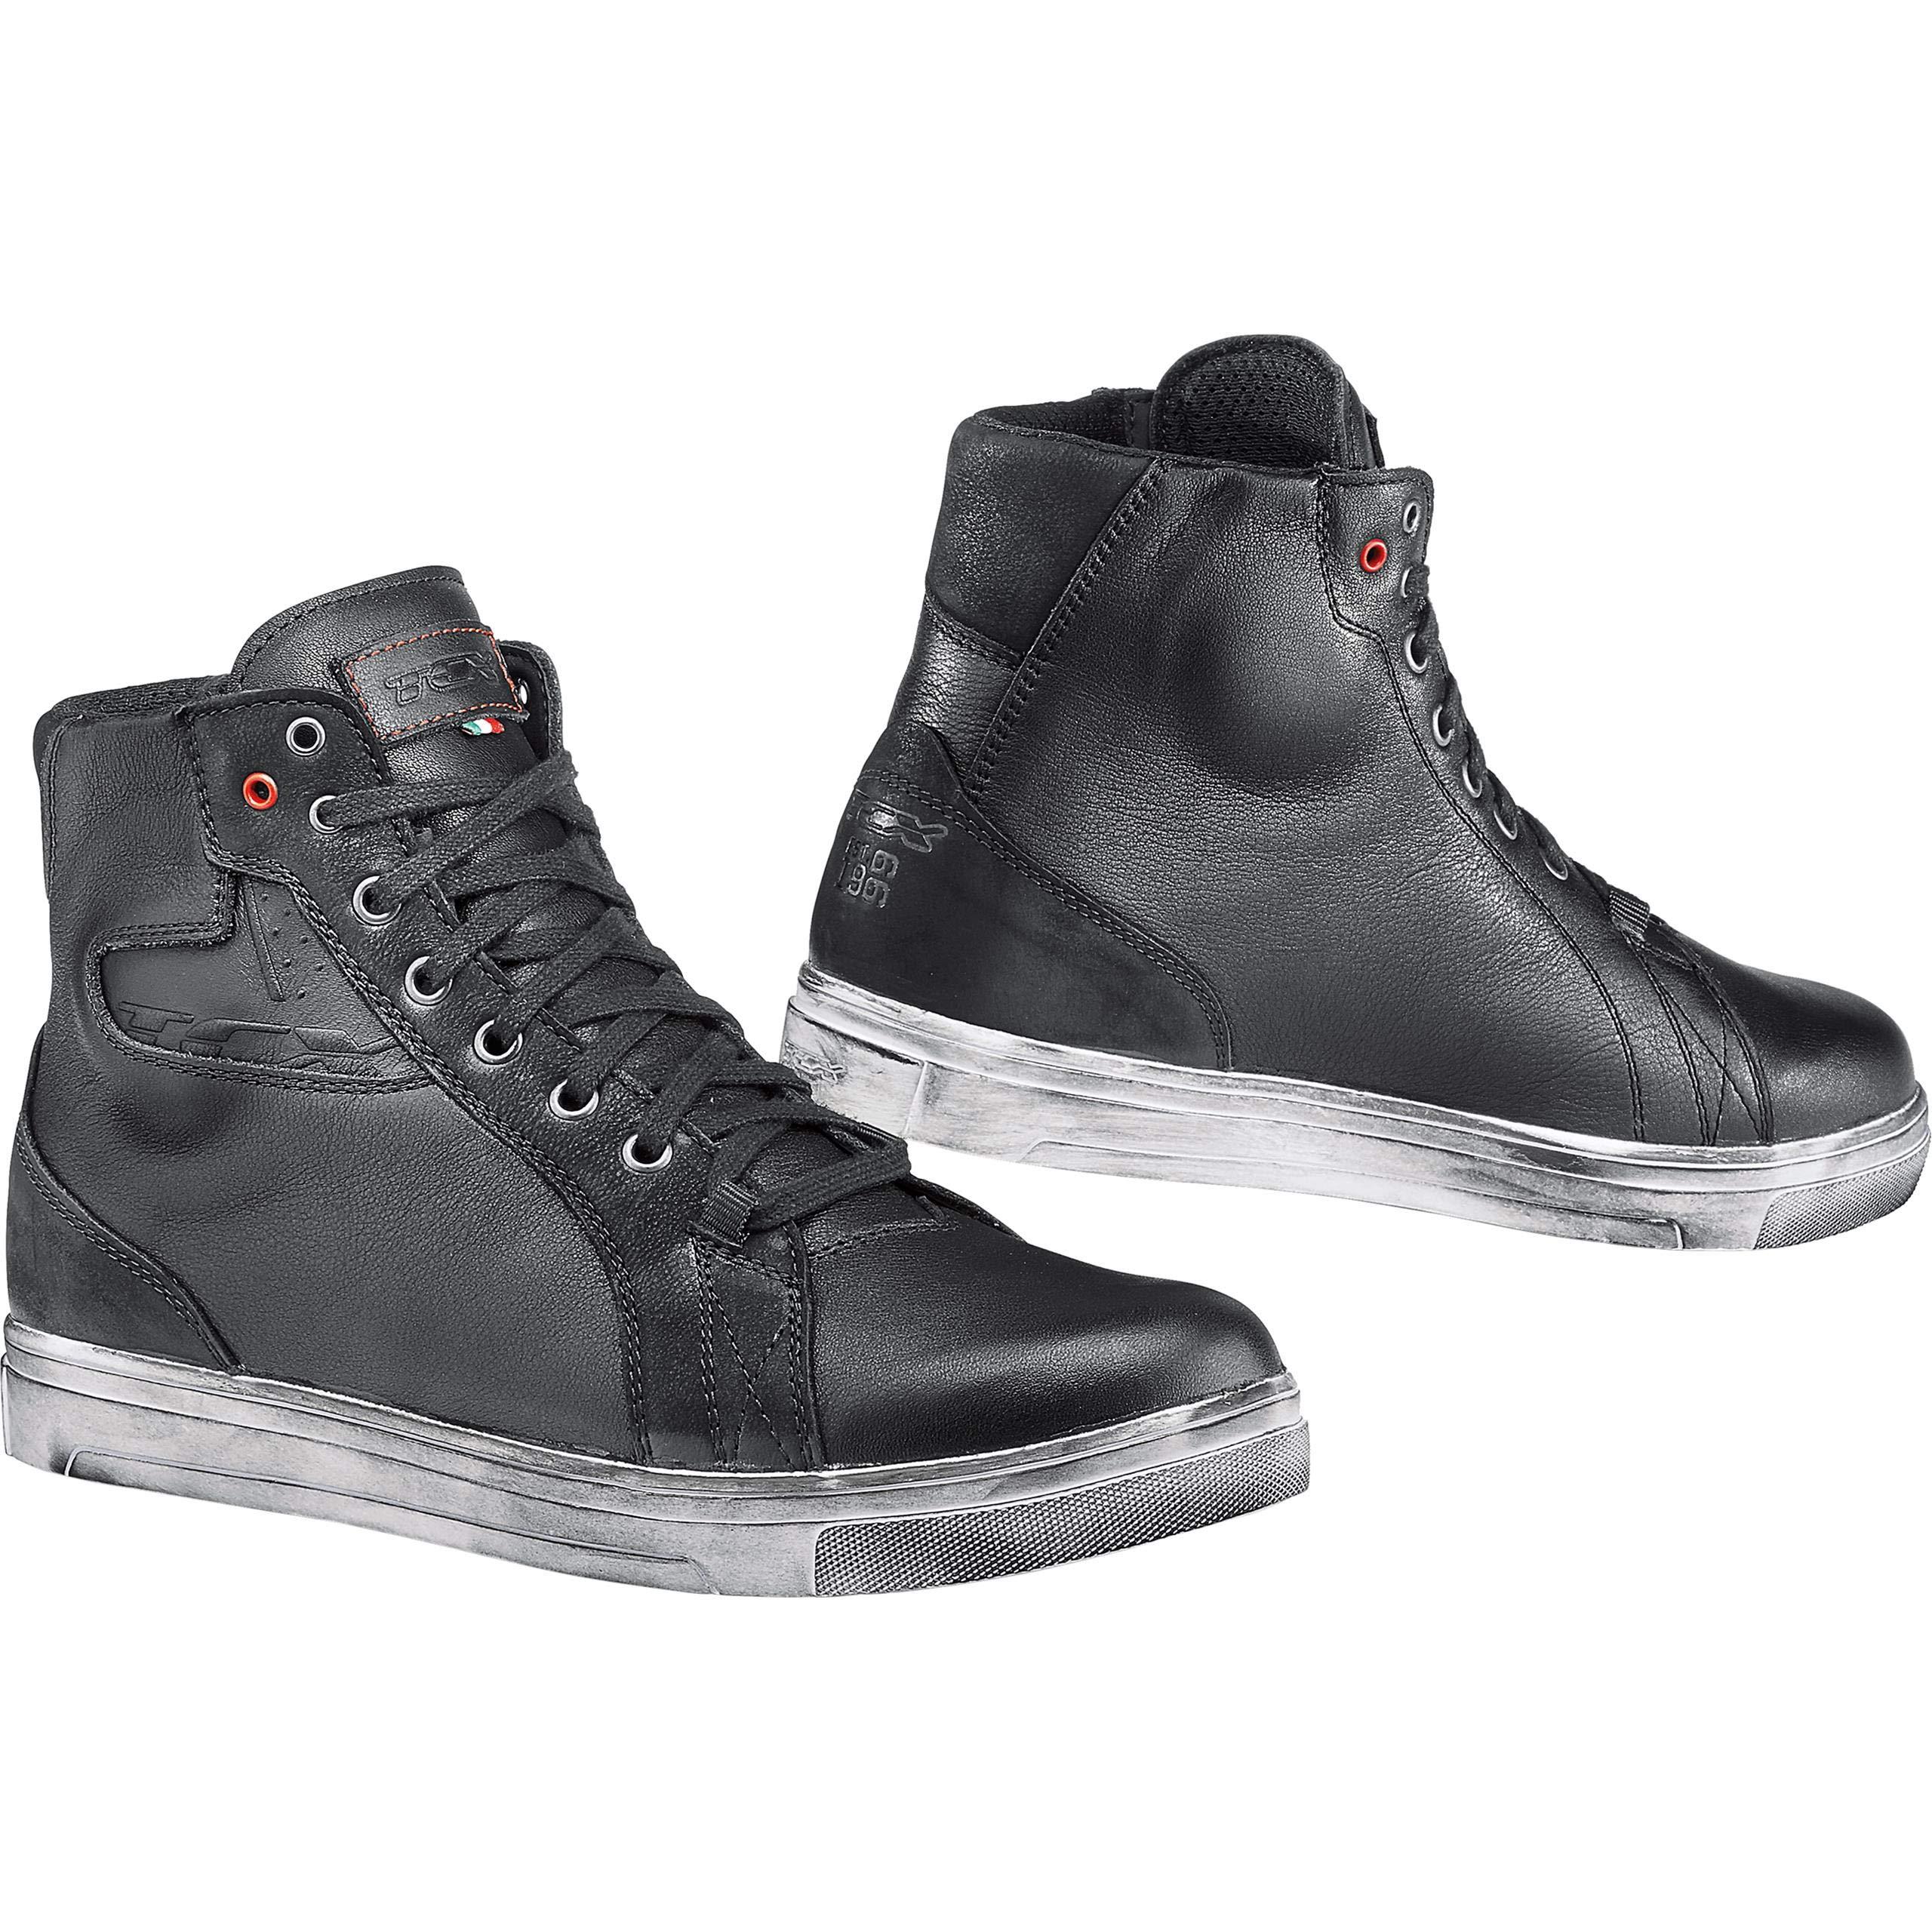 TCX Street Ace Waterproof Men's Street Motorcycle Shoes - Black / 39